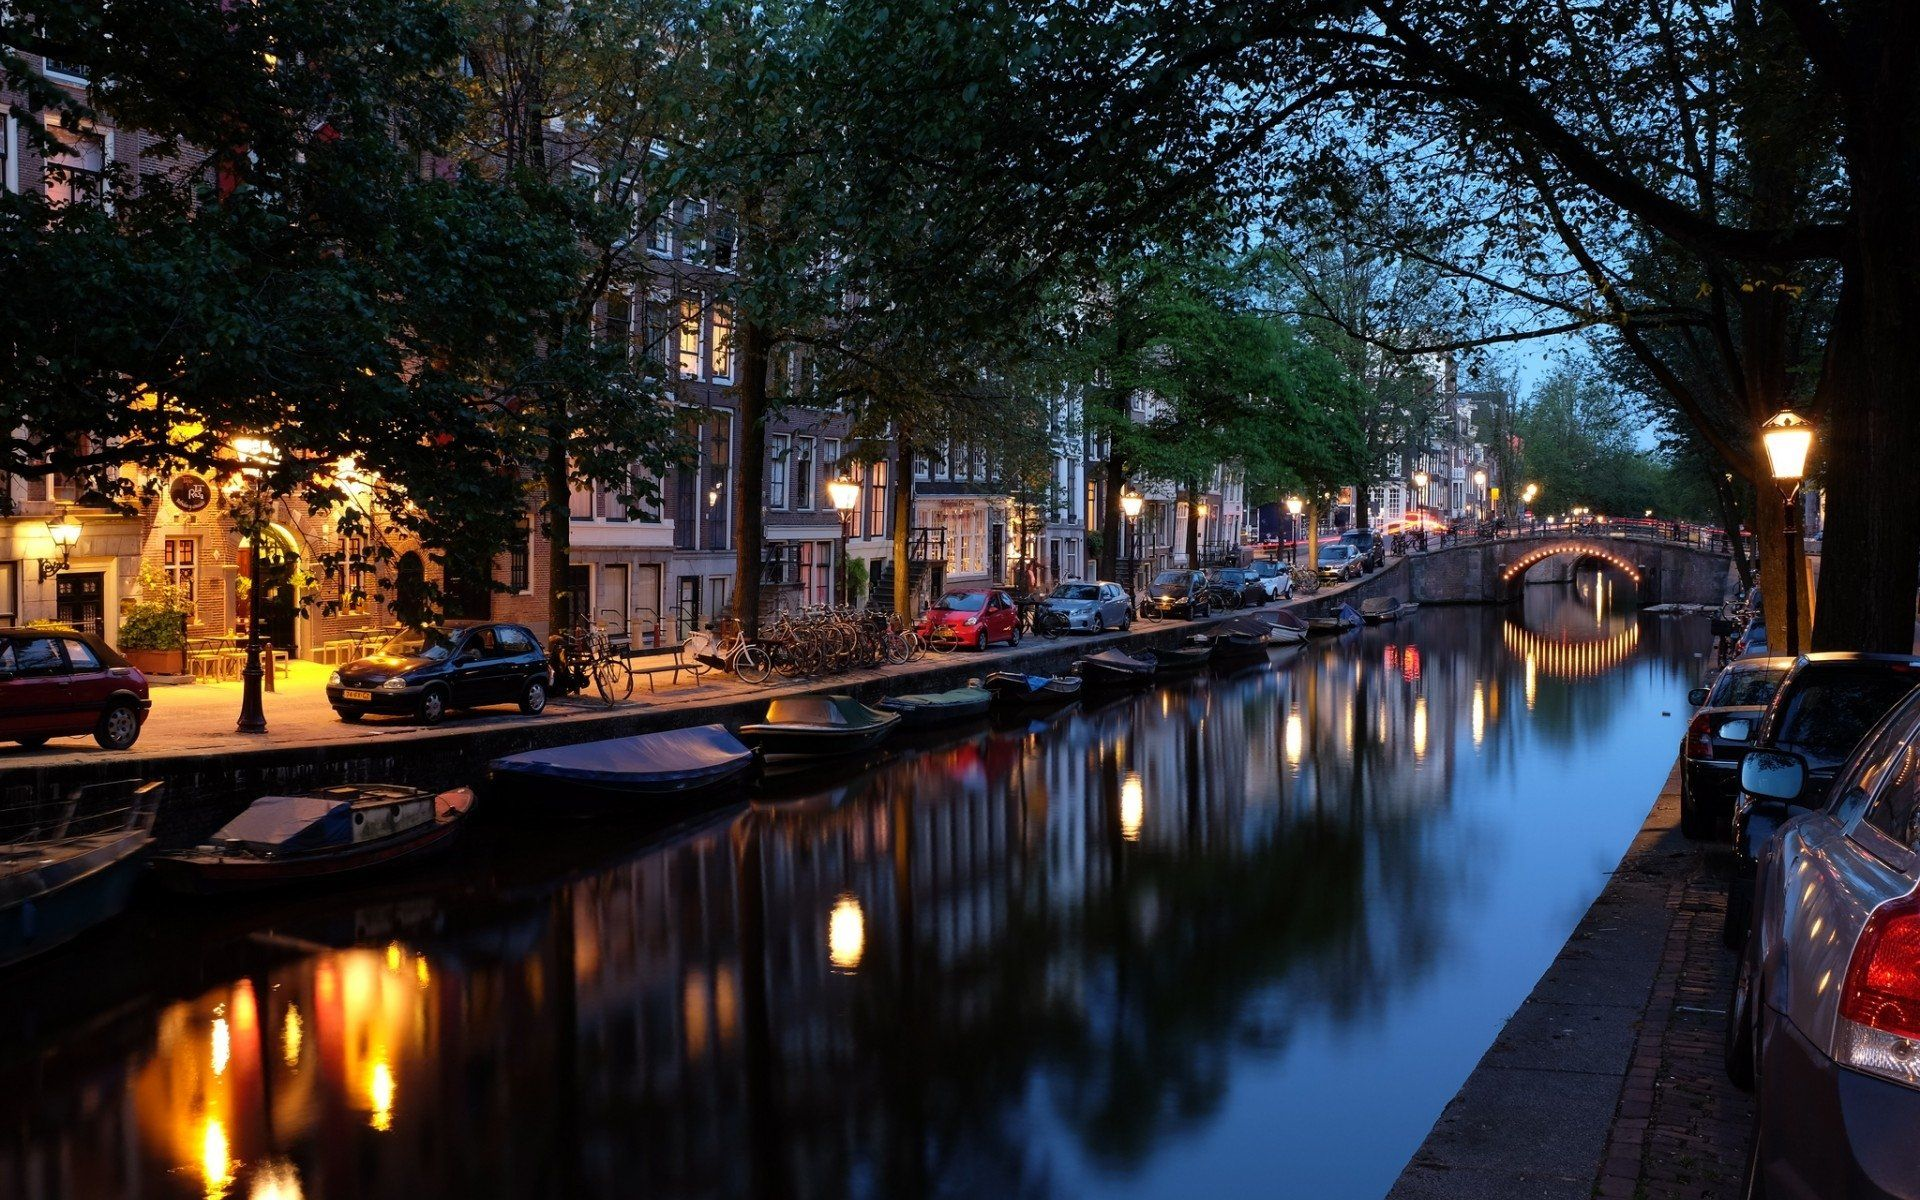 Amsterdam Desktop Wallpapers Top Free Amsterdam Desktop Backgrounds Wallpaperaccess